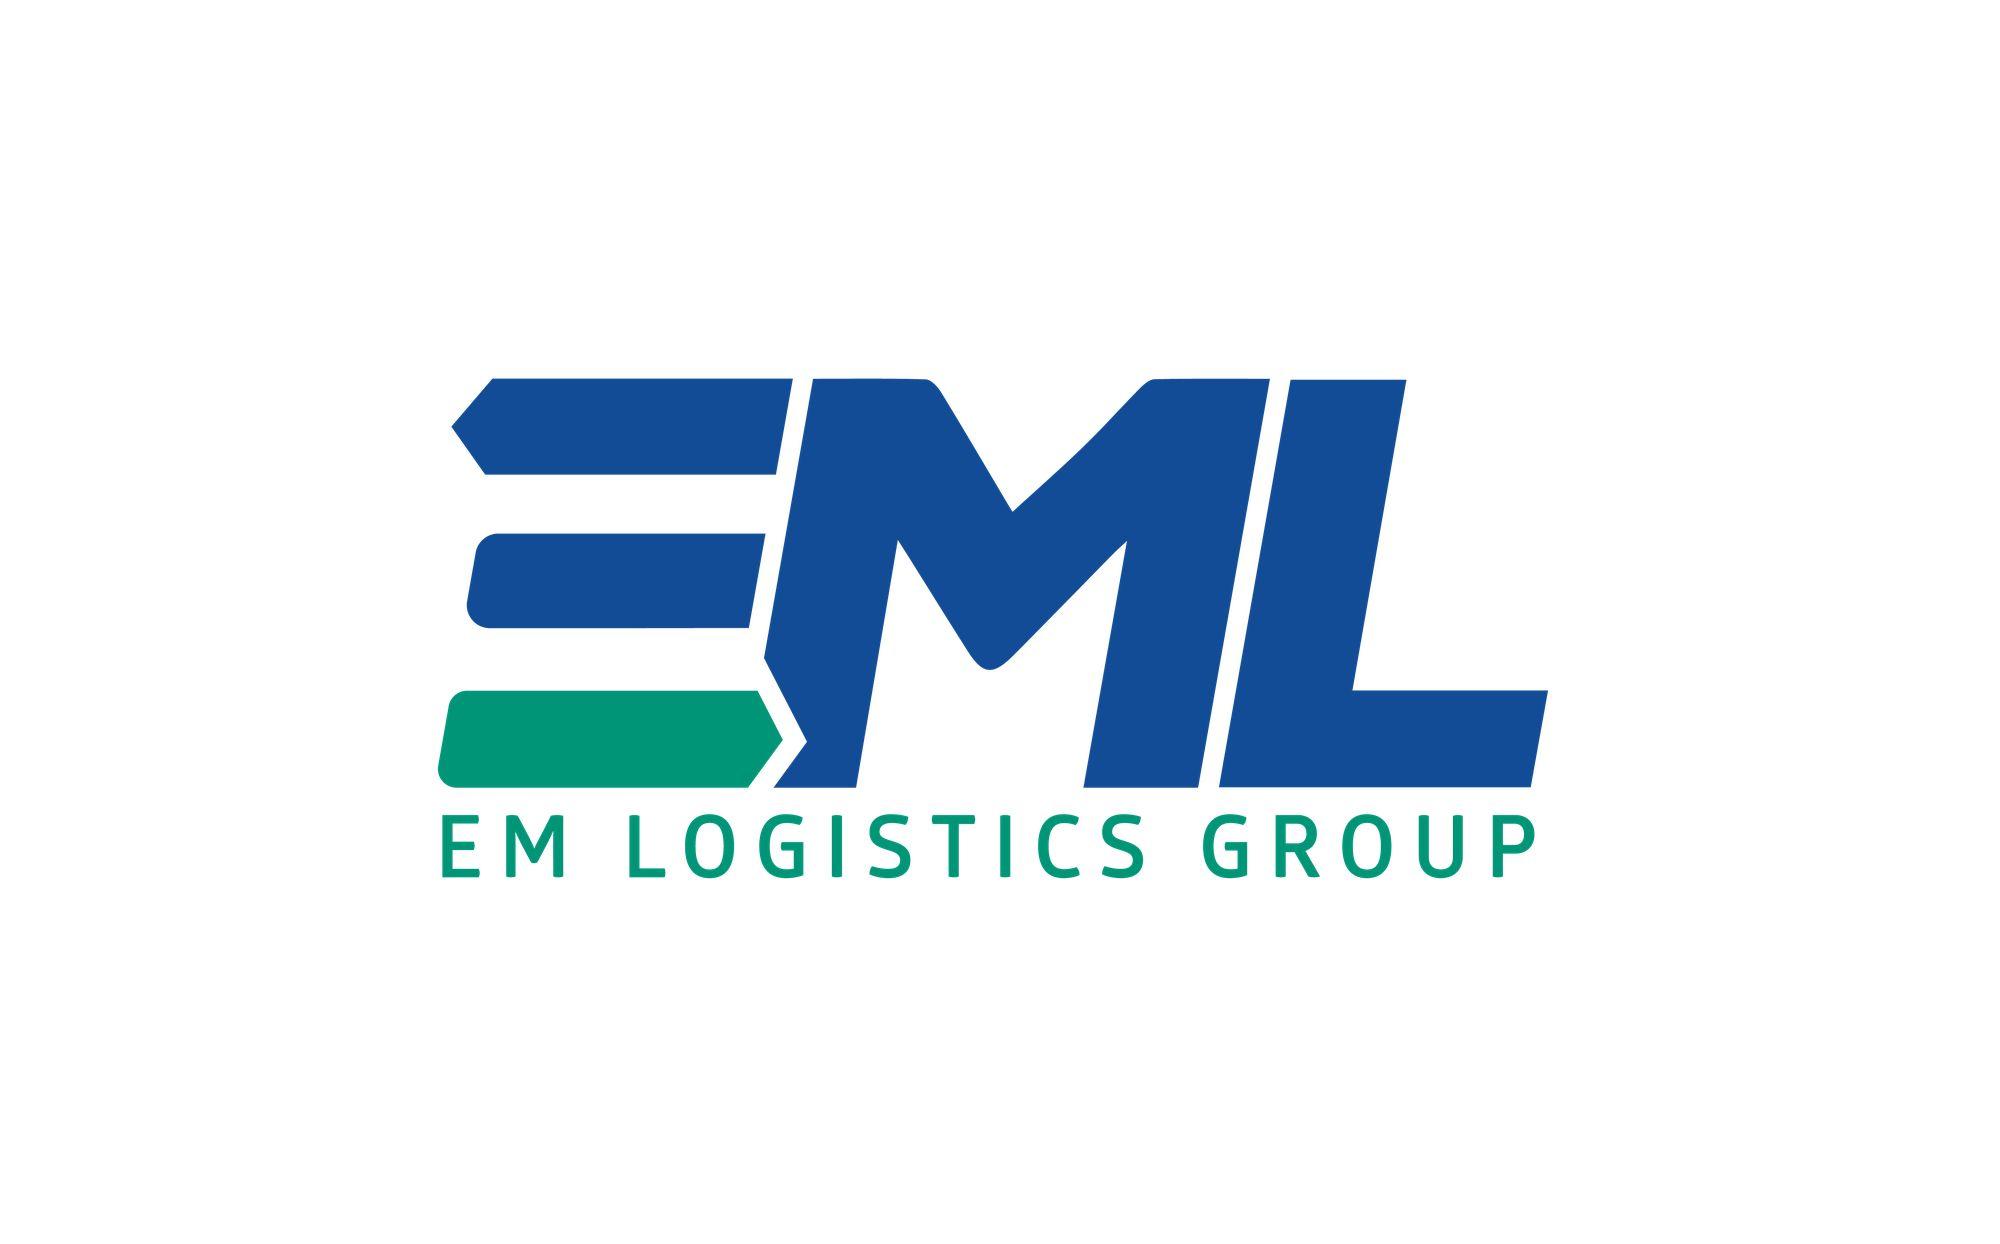 EML Group